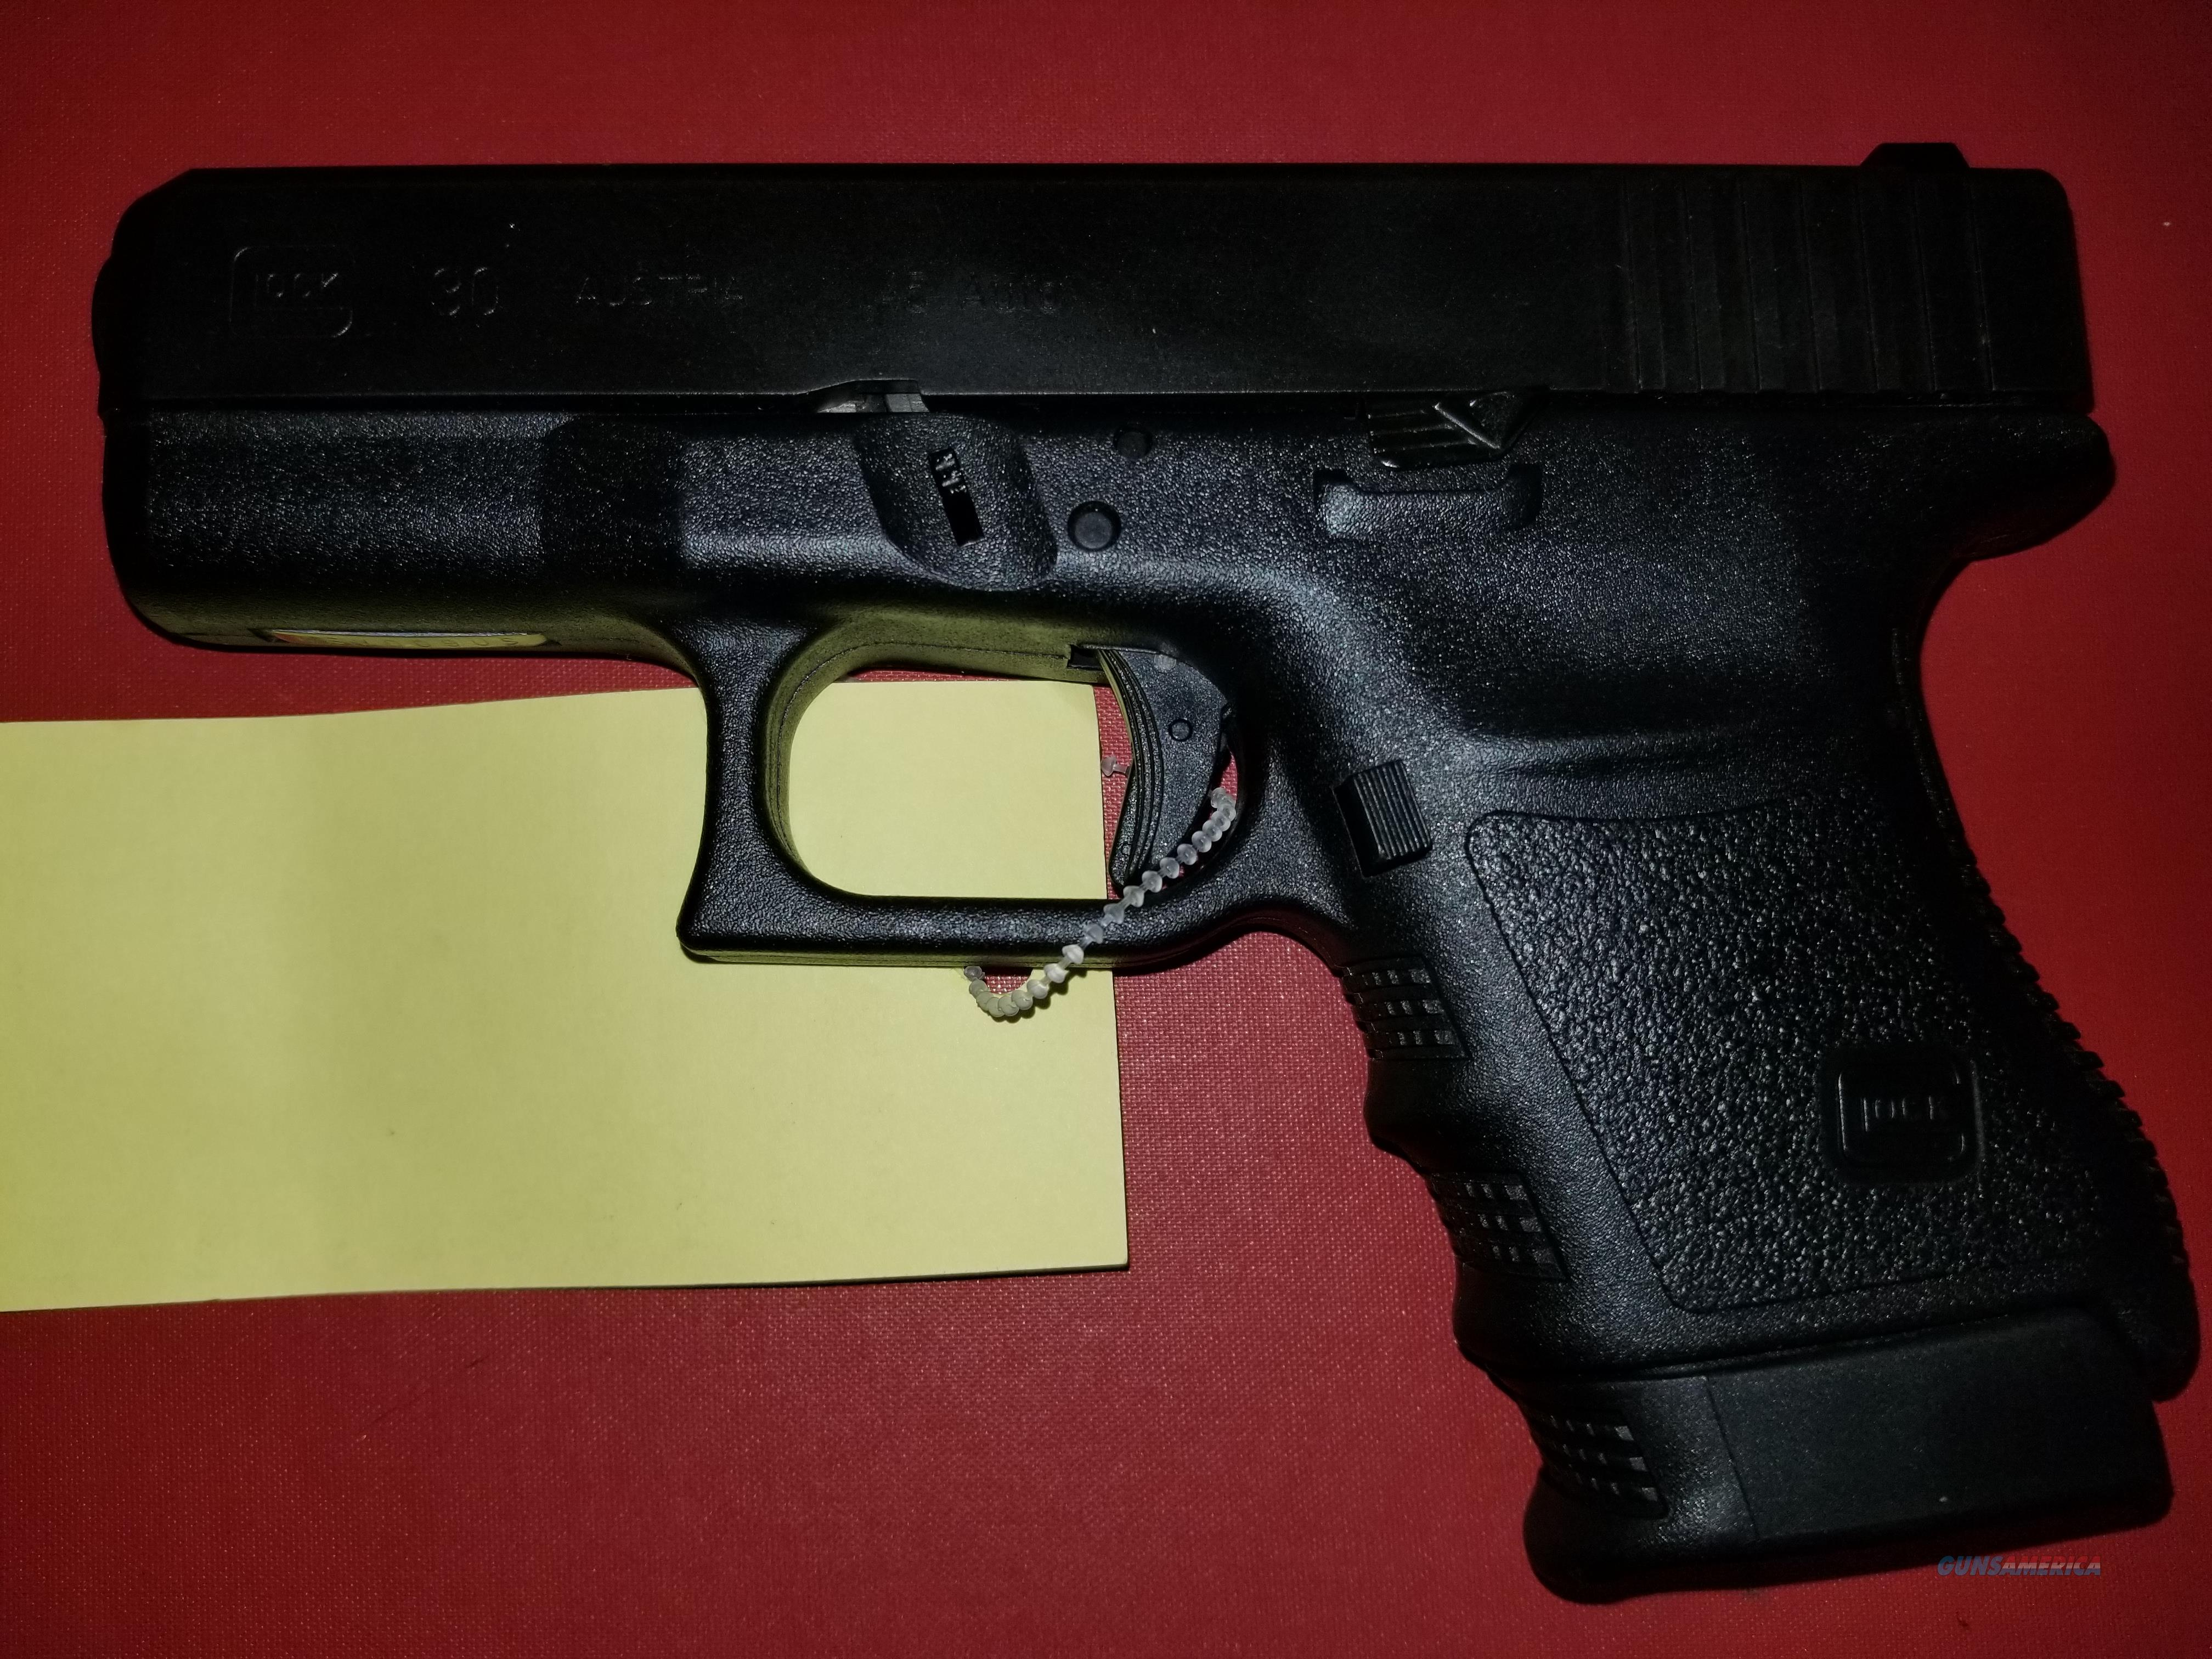 Glock 30  Guns > Pistols > Glock Pistols > 29/30/36